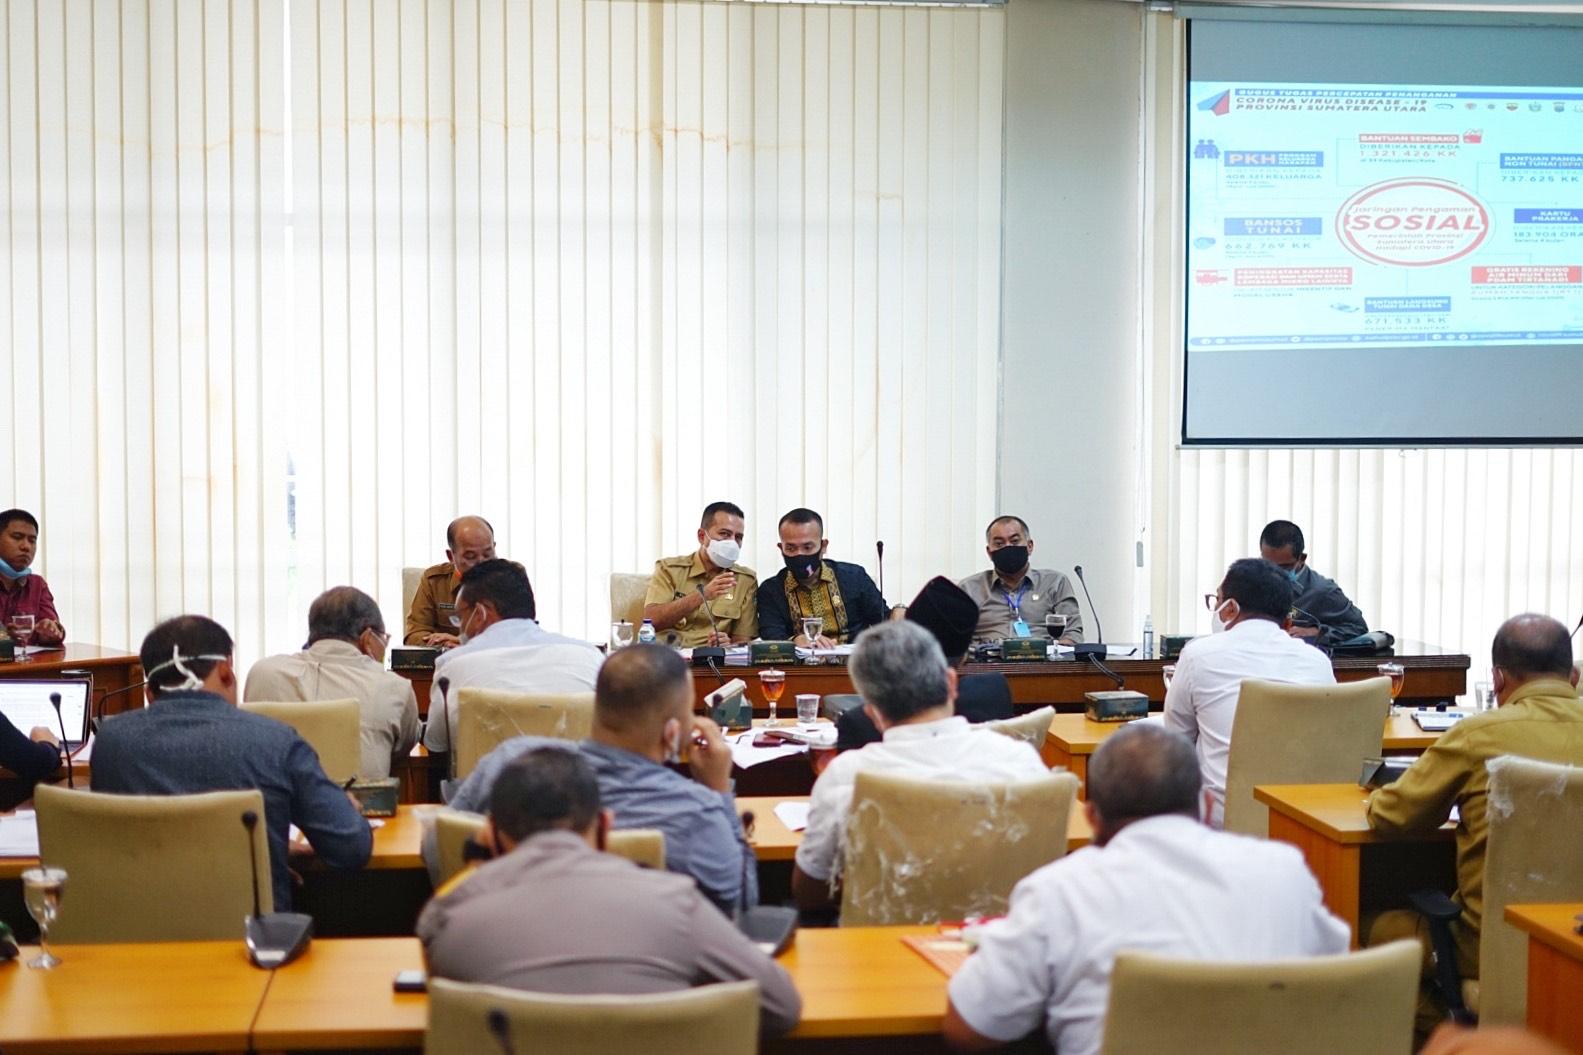 Ket. Foto : Wakil Gubernur Sumatra Utara Musa Rajekshah berserta tim GGTP Covid-19 Sumatra Utara menghadiri Rapat Dengar Pendapat bersama Pansus Covid-19 DPRD Sumatra Utara di Kantor DPRD Sumut, pada Selasa (26/5/2020). (ist)